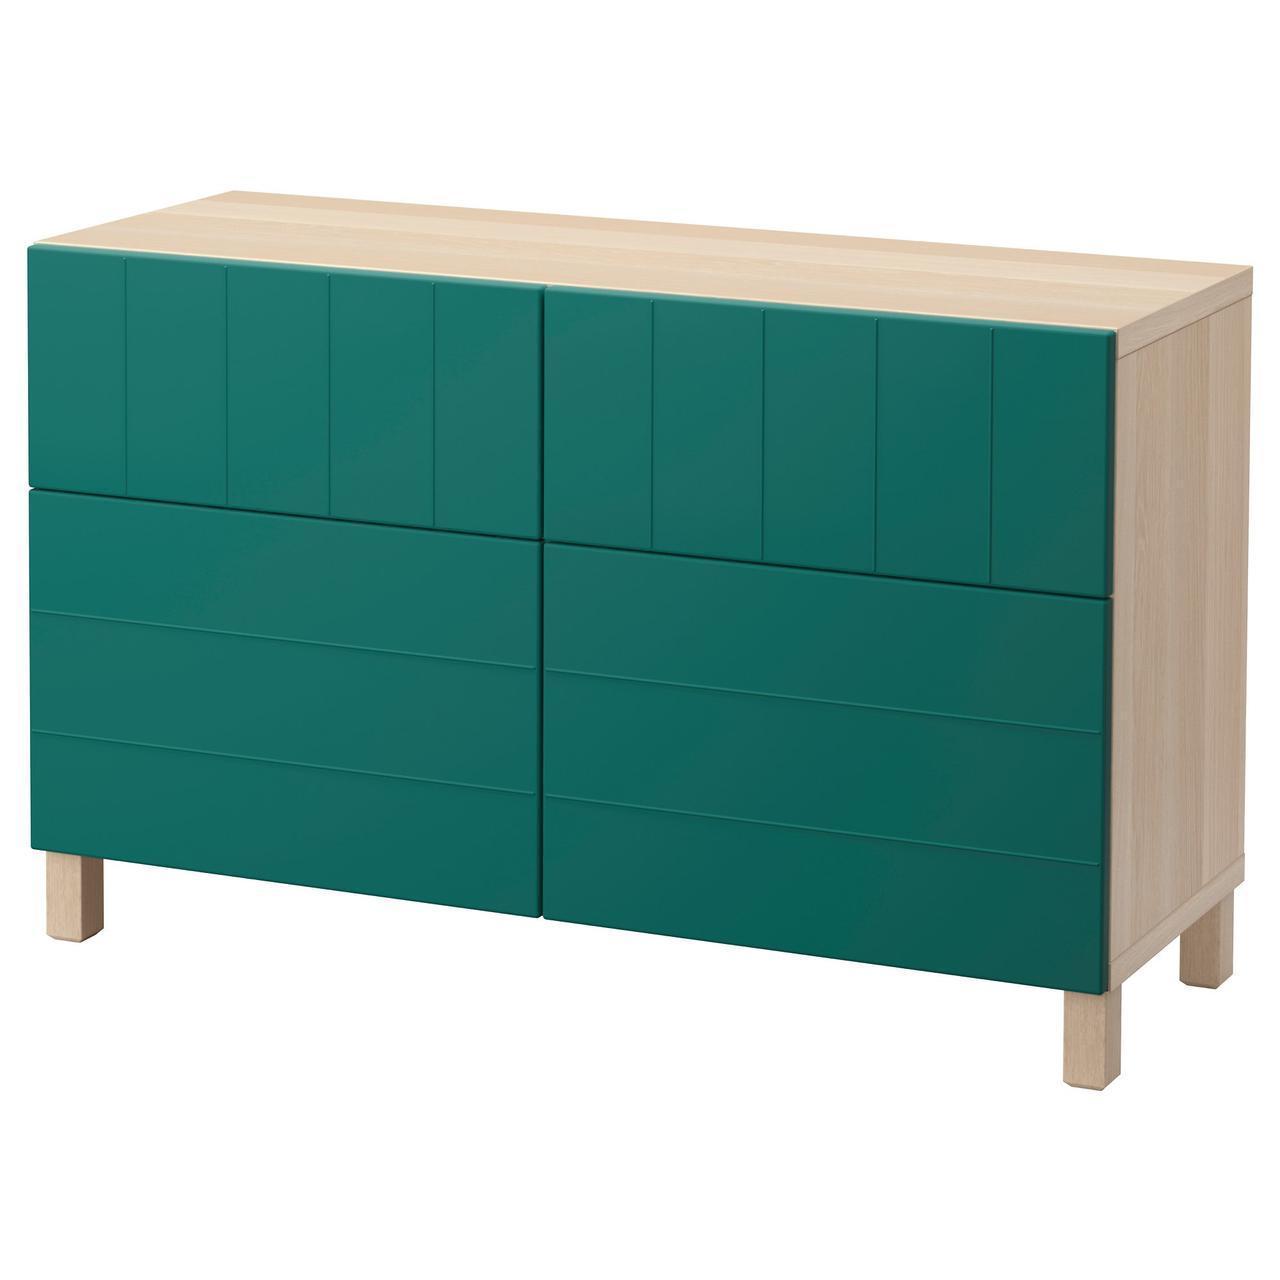 Тумба IKEA BESTÅ 120x40x74 см Hallstavik беленый дуб сине-зеленая 892.061.30